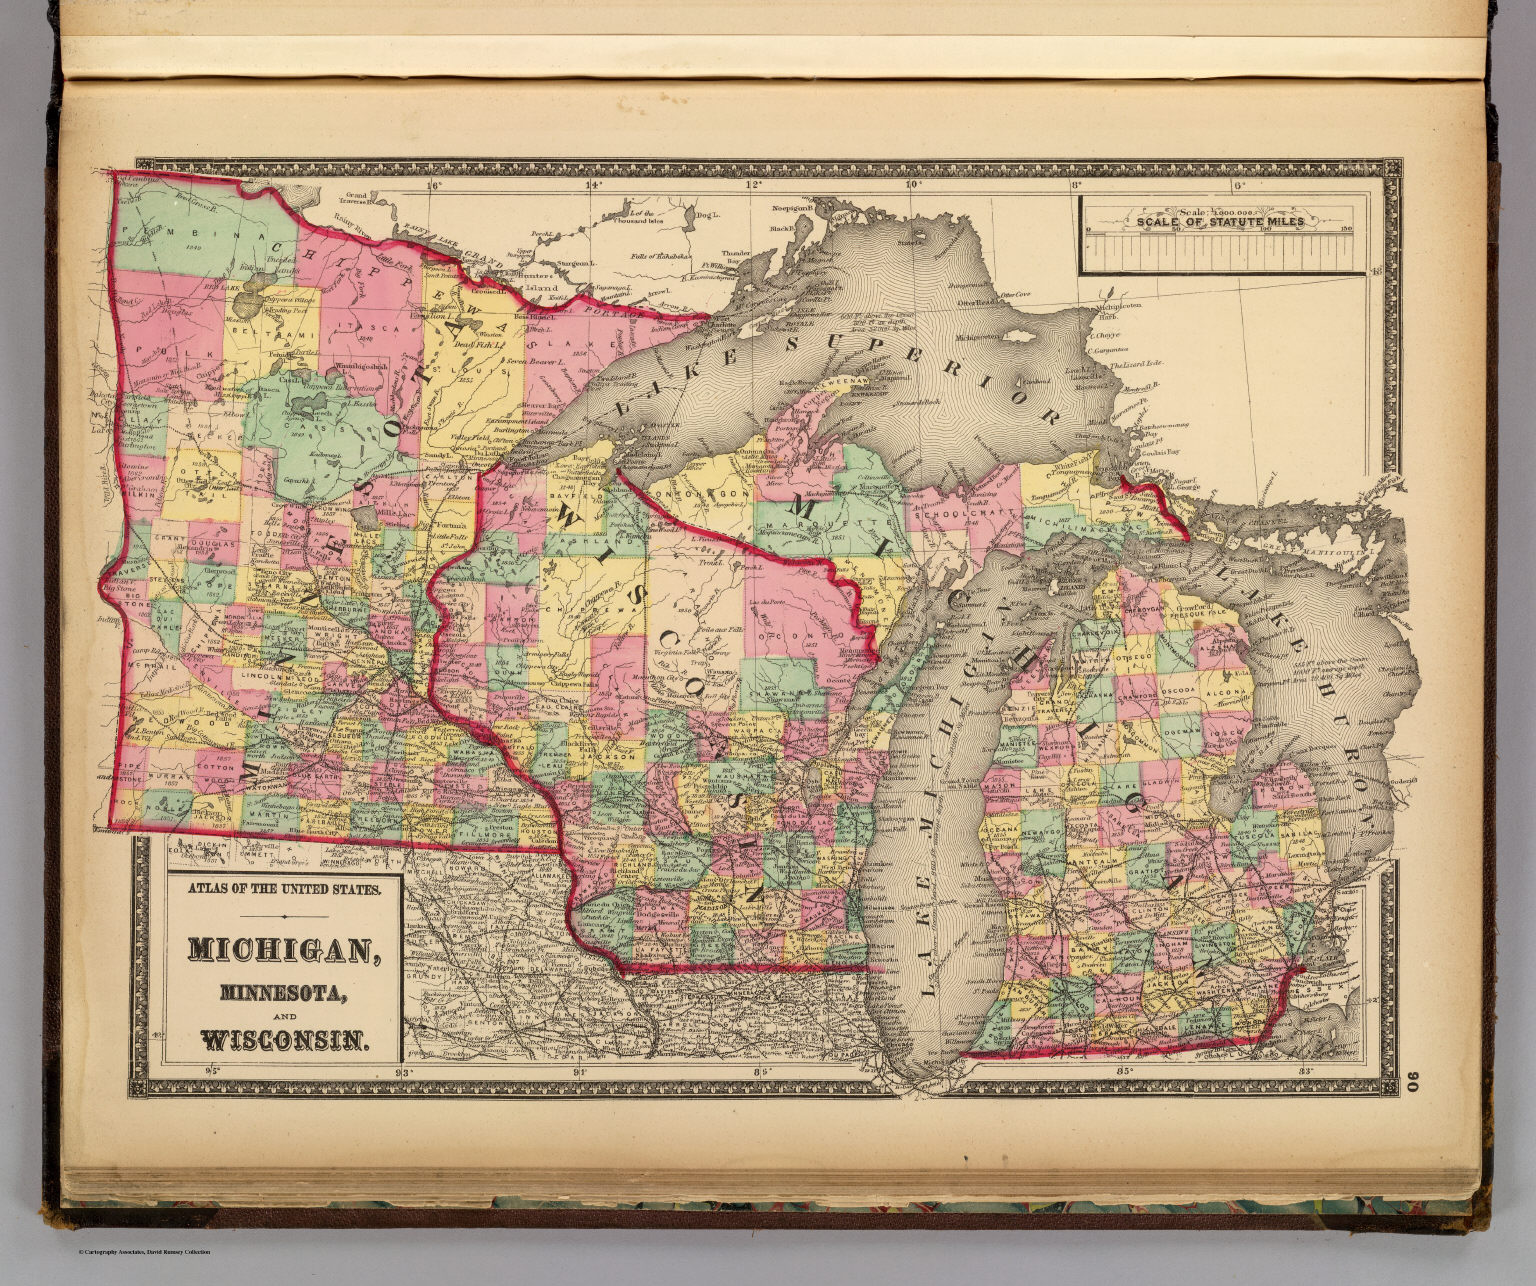 Michigan, Minnesota, and Wisconsin. - David Rumsey Historical Map ...